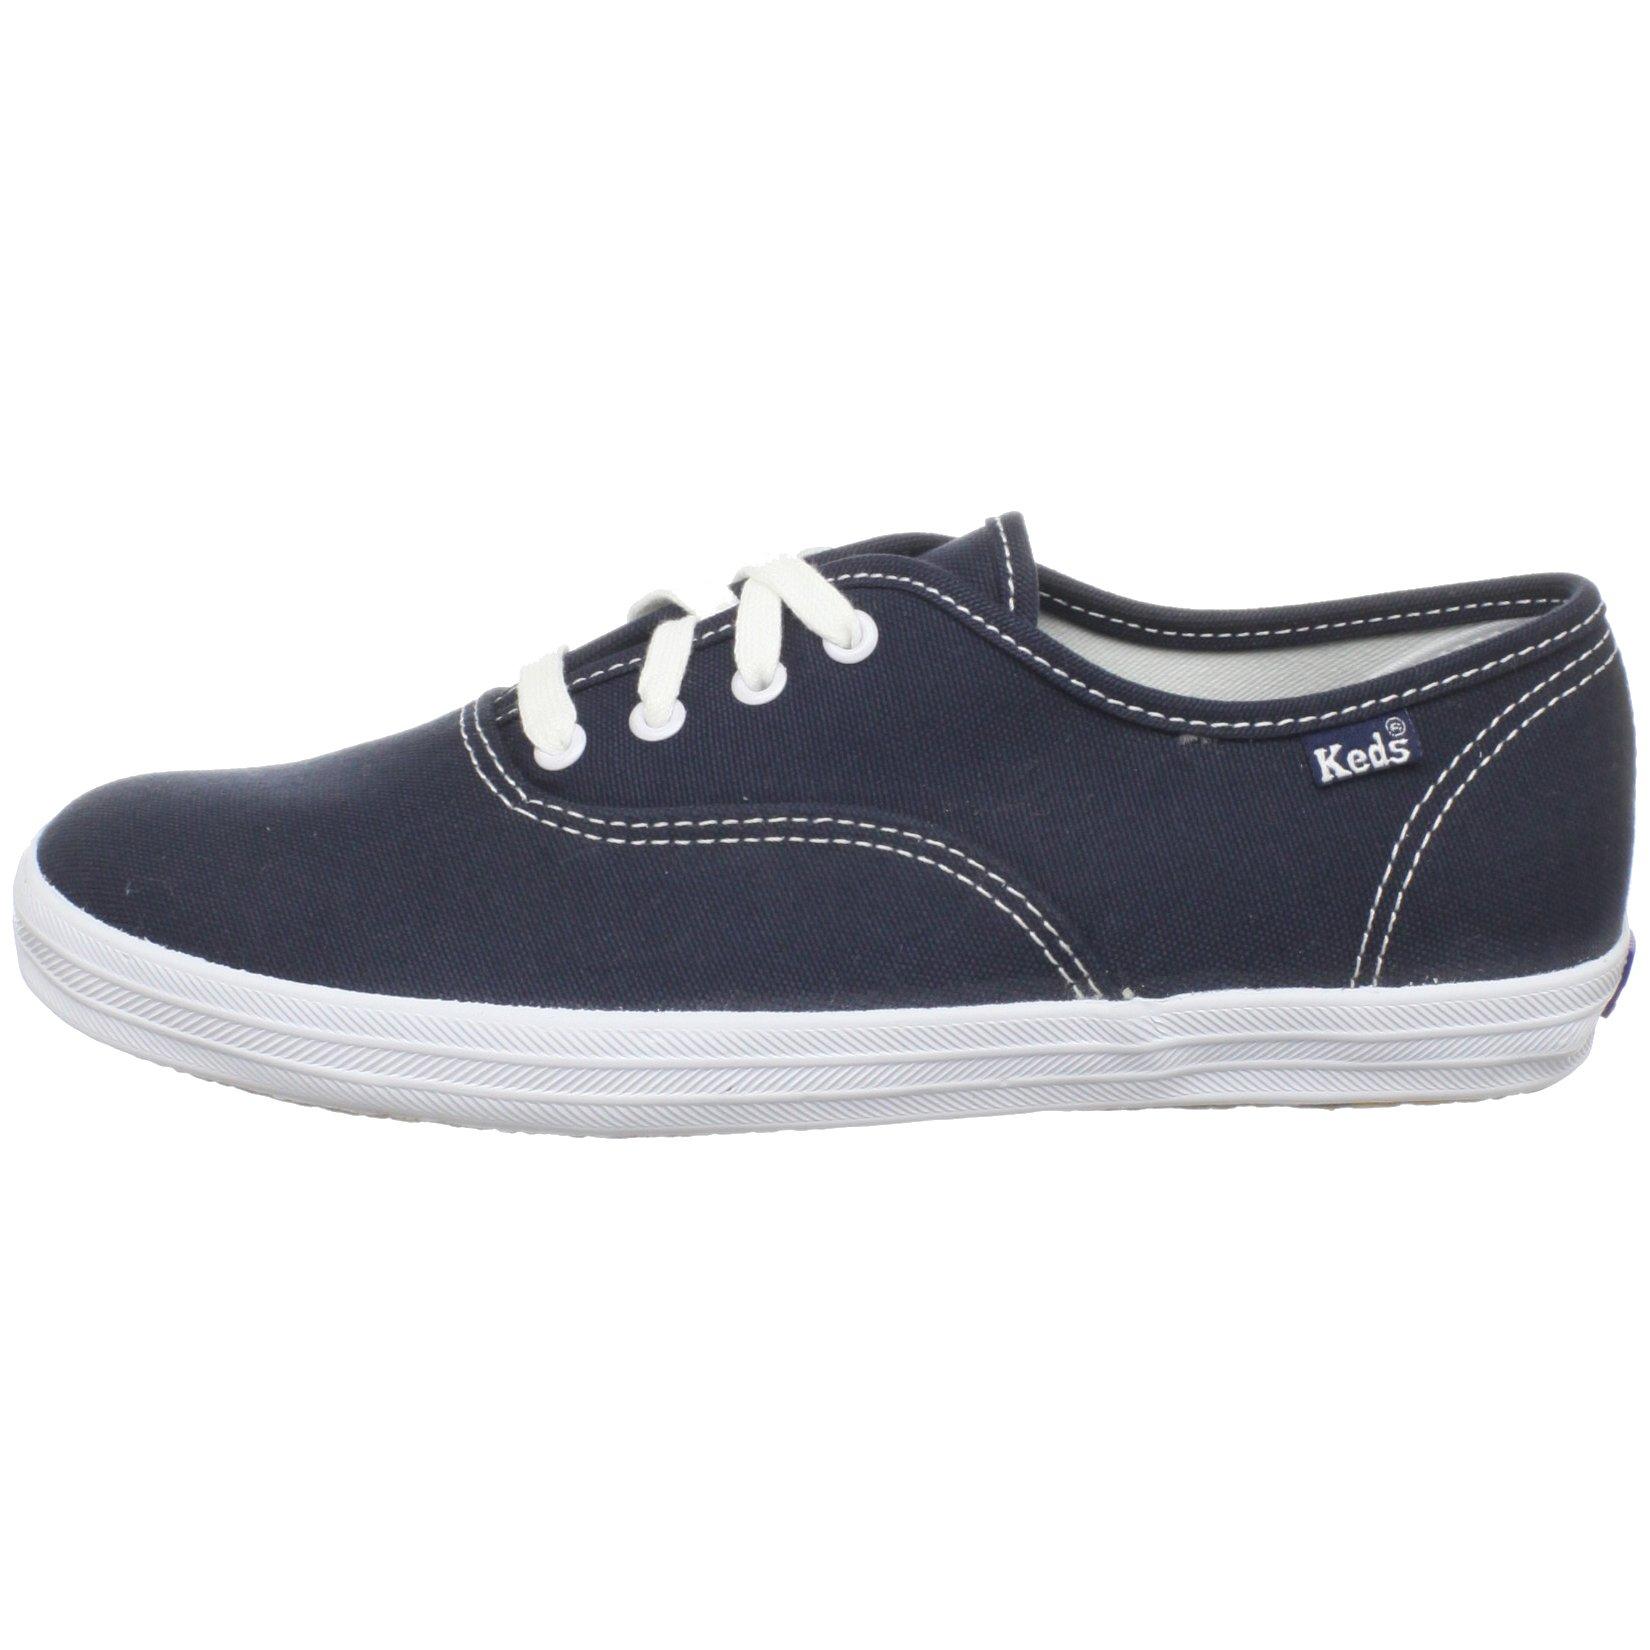 Keds Original Champion CVO Sneaker (Toddler/Little Kid/Big Kid),Navy/White,13.5 M US Little Kid by Keds (Image #5)